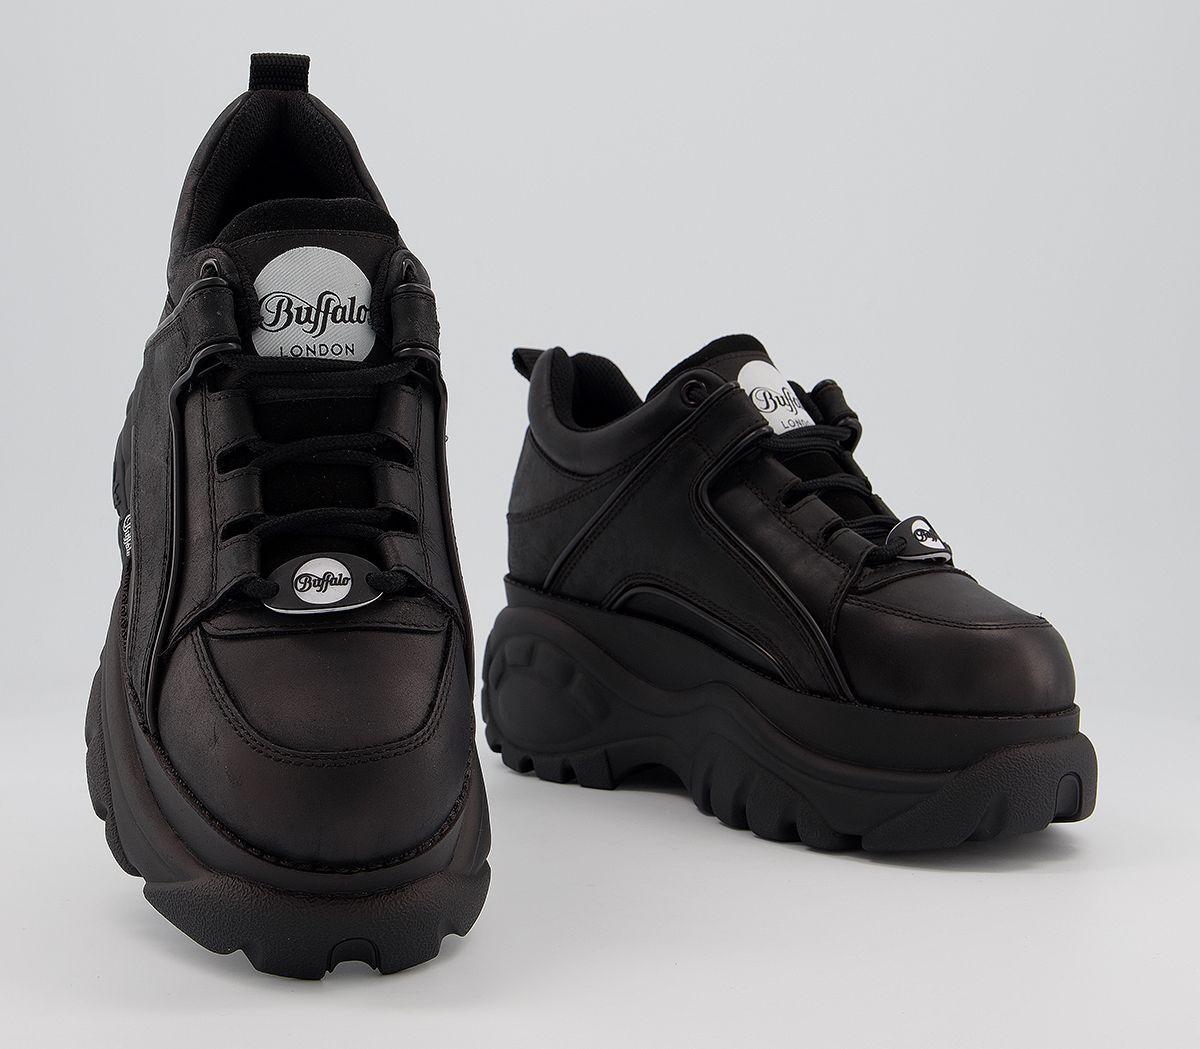 c2a953d8fa4b Buffalo Buffalo Classic Low Sneakers Black - Hers trainers